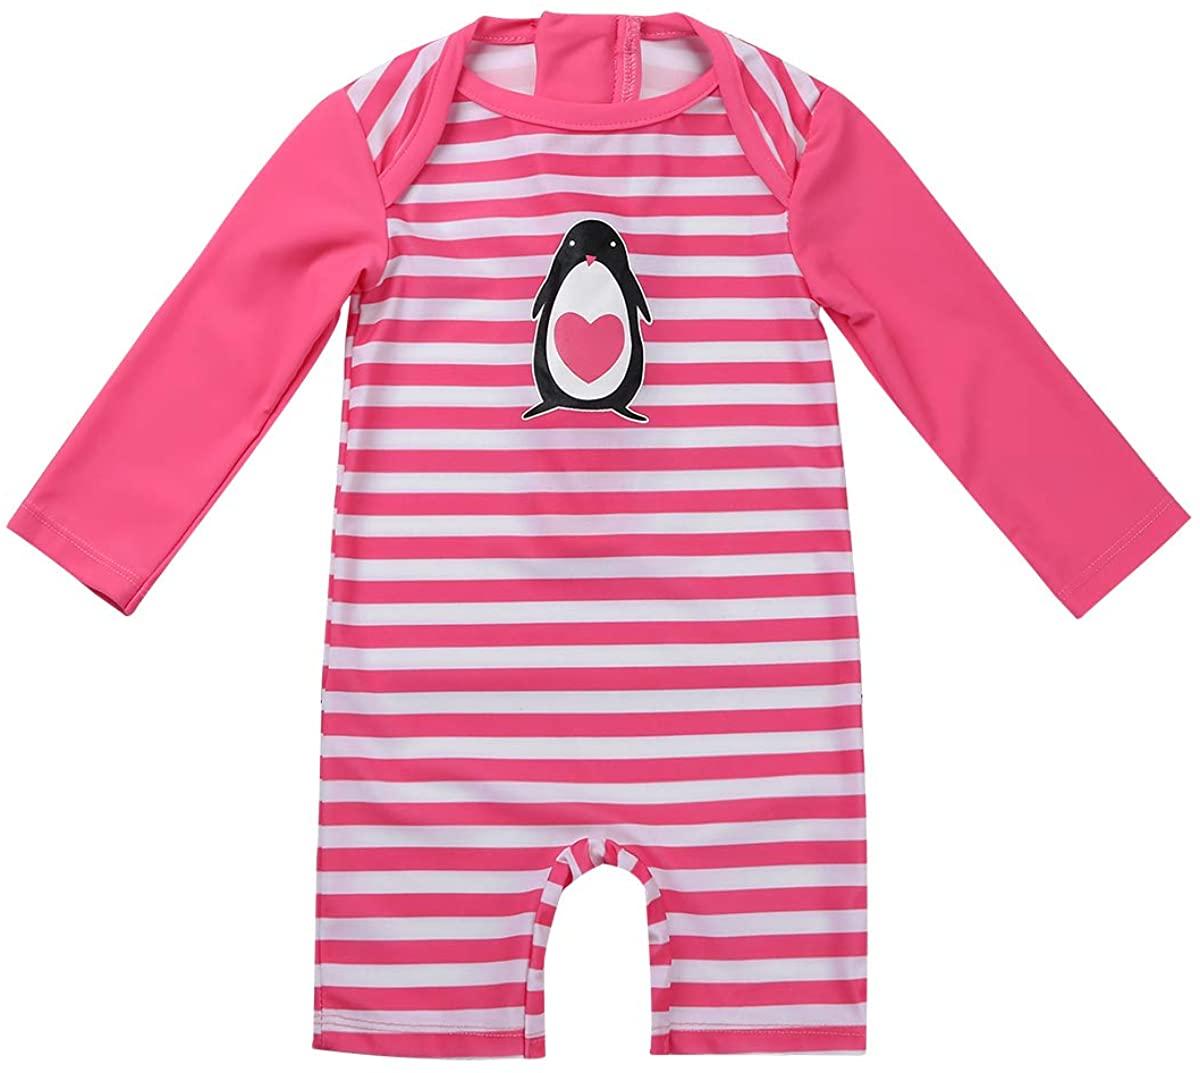 Agoky Baby Girls One Piece Striped Zip Rash Guard Swimsuit Sun Protection Swimwear Wetsuit UPF 50+